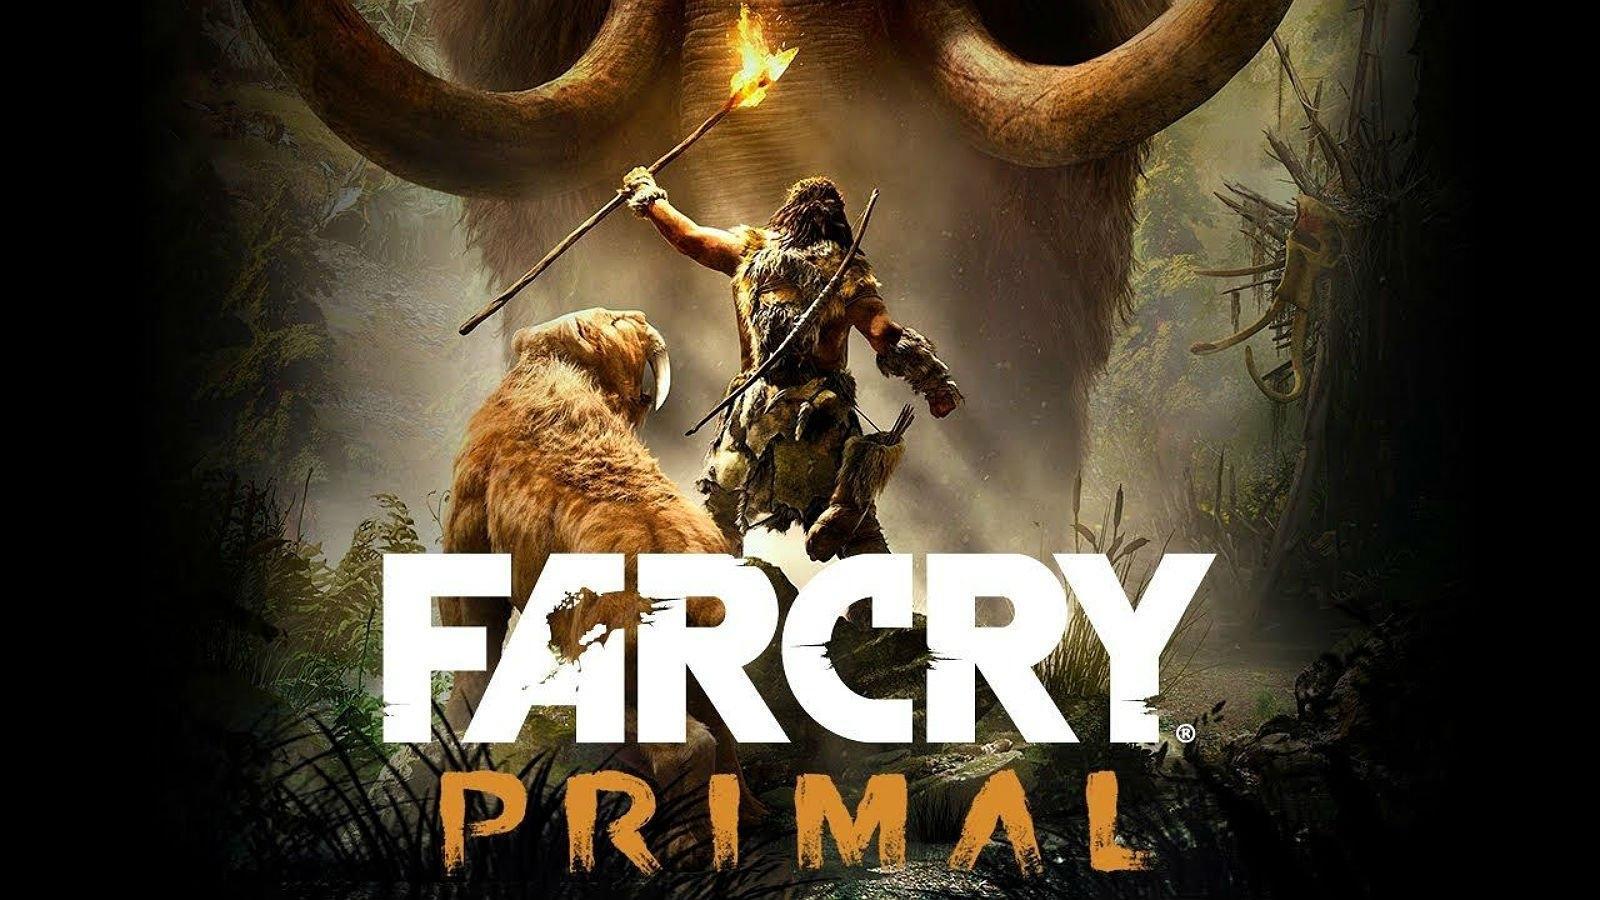 Обзор на игру FARCRY PRIMAL для Xbox